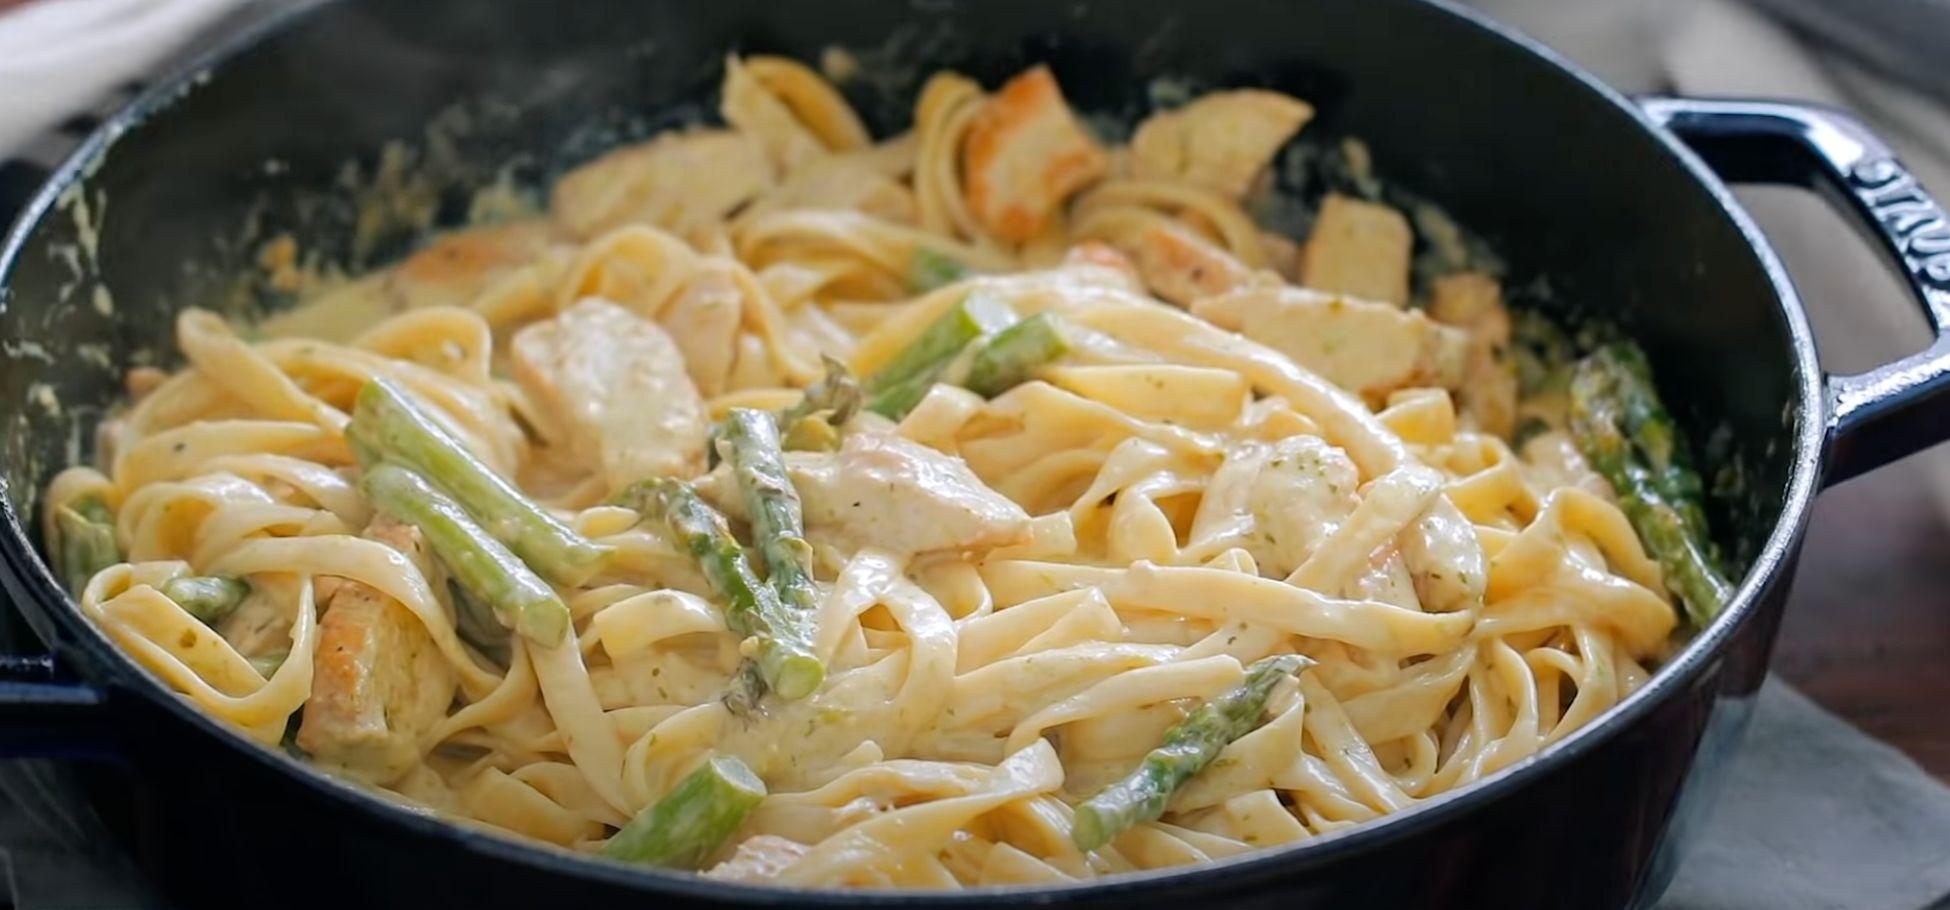 Creamy Chicken and Asparagus Pasta Recipe